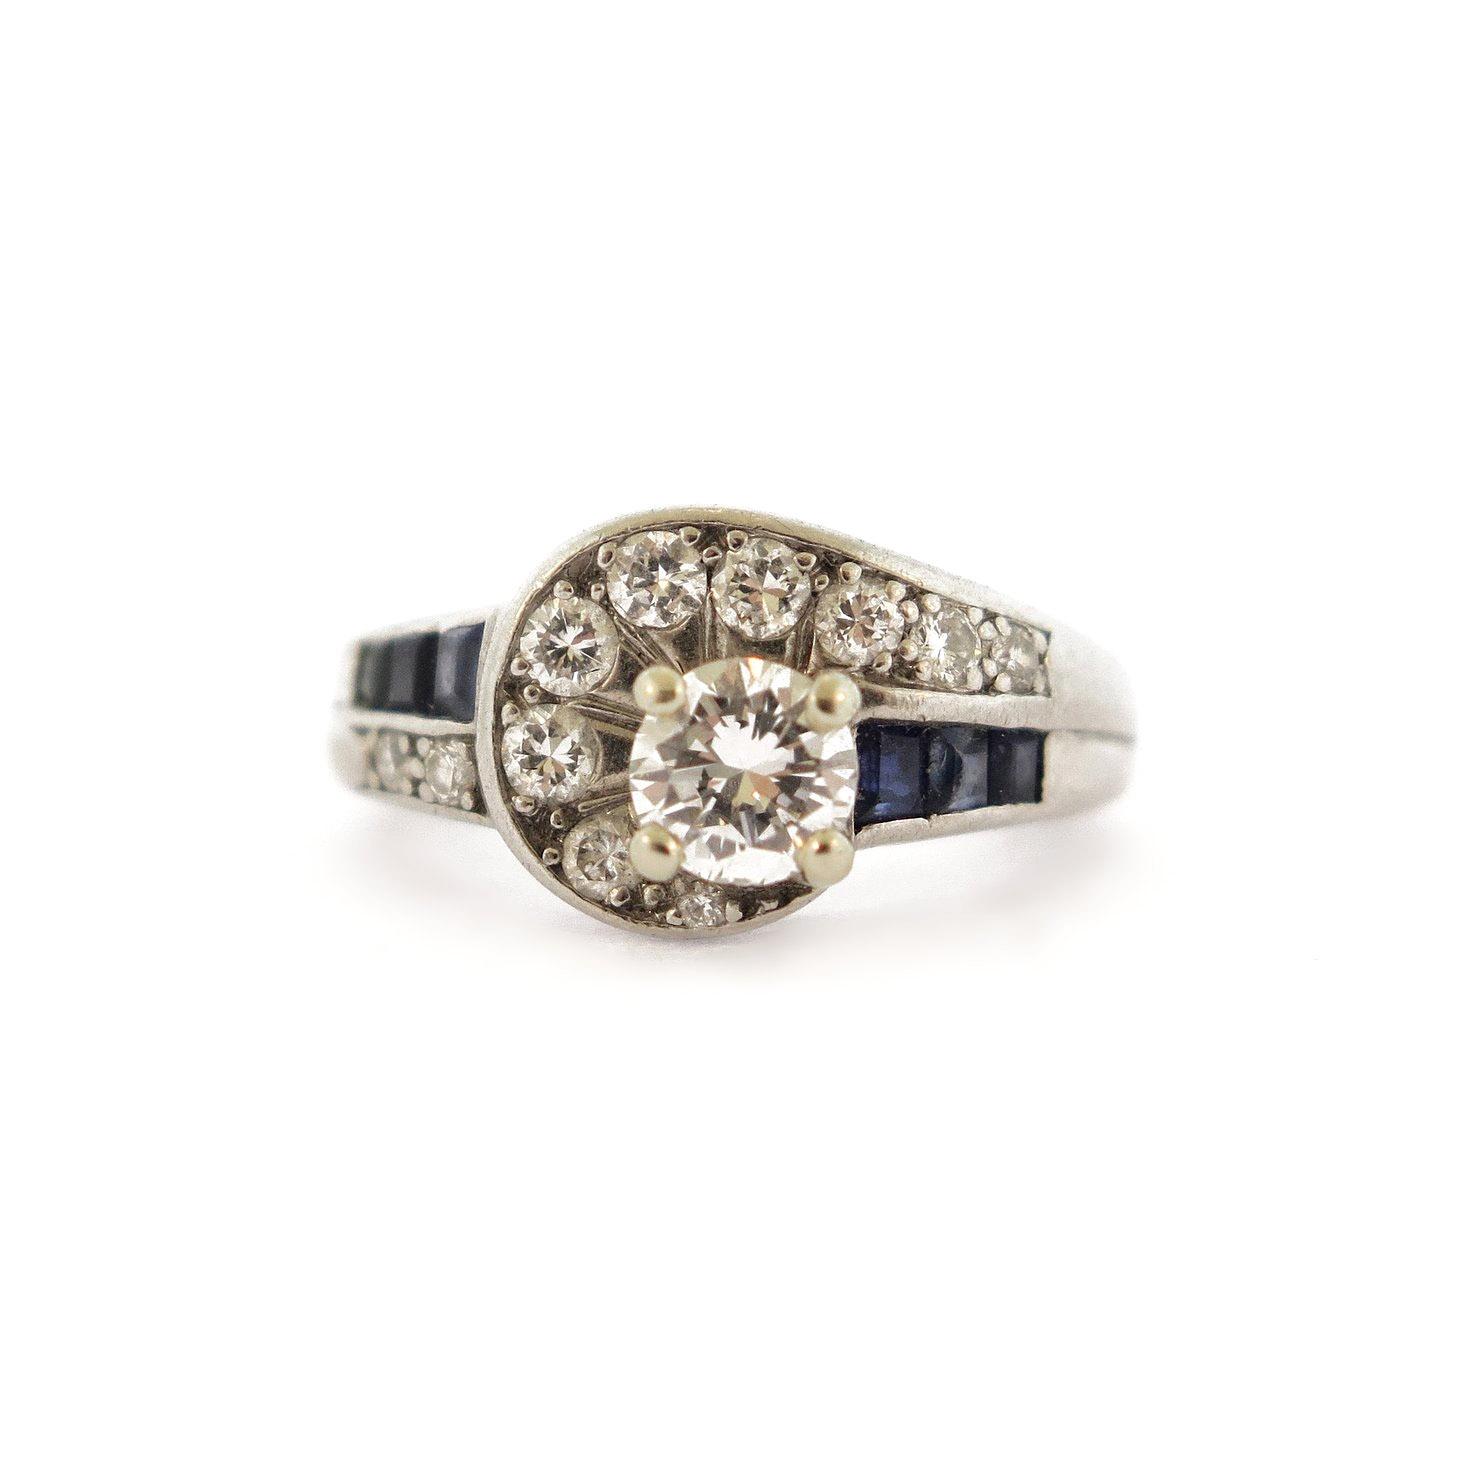 1950s Diamond & Sapphire Accent Ring